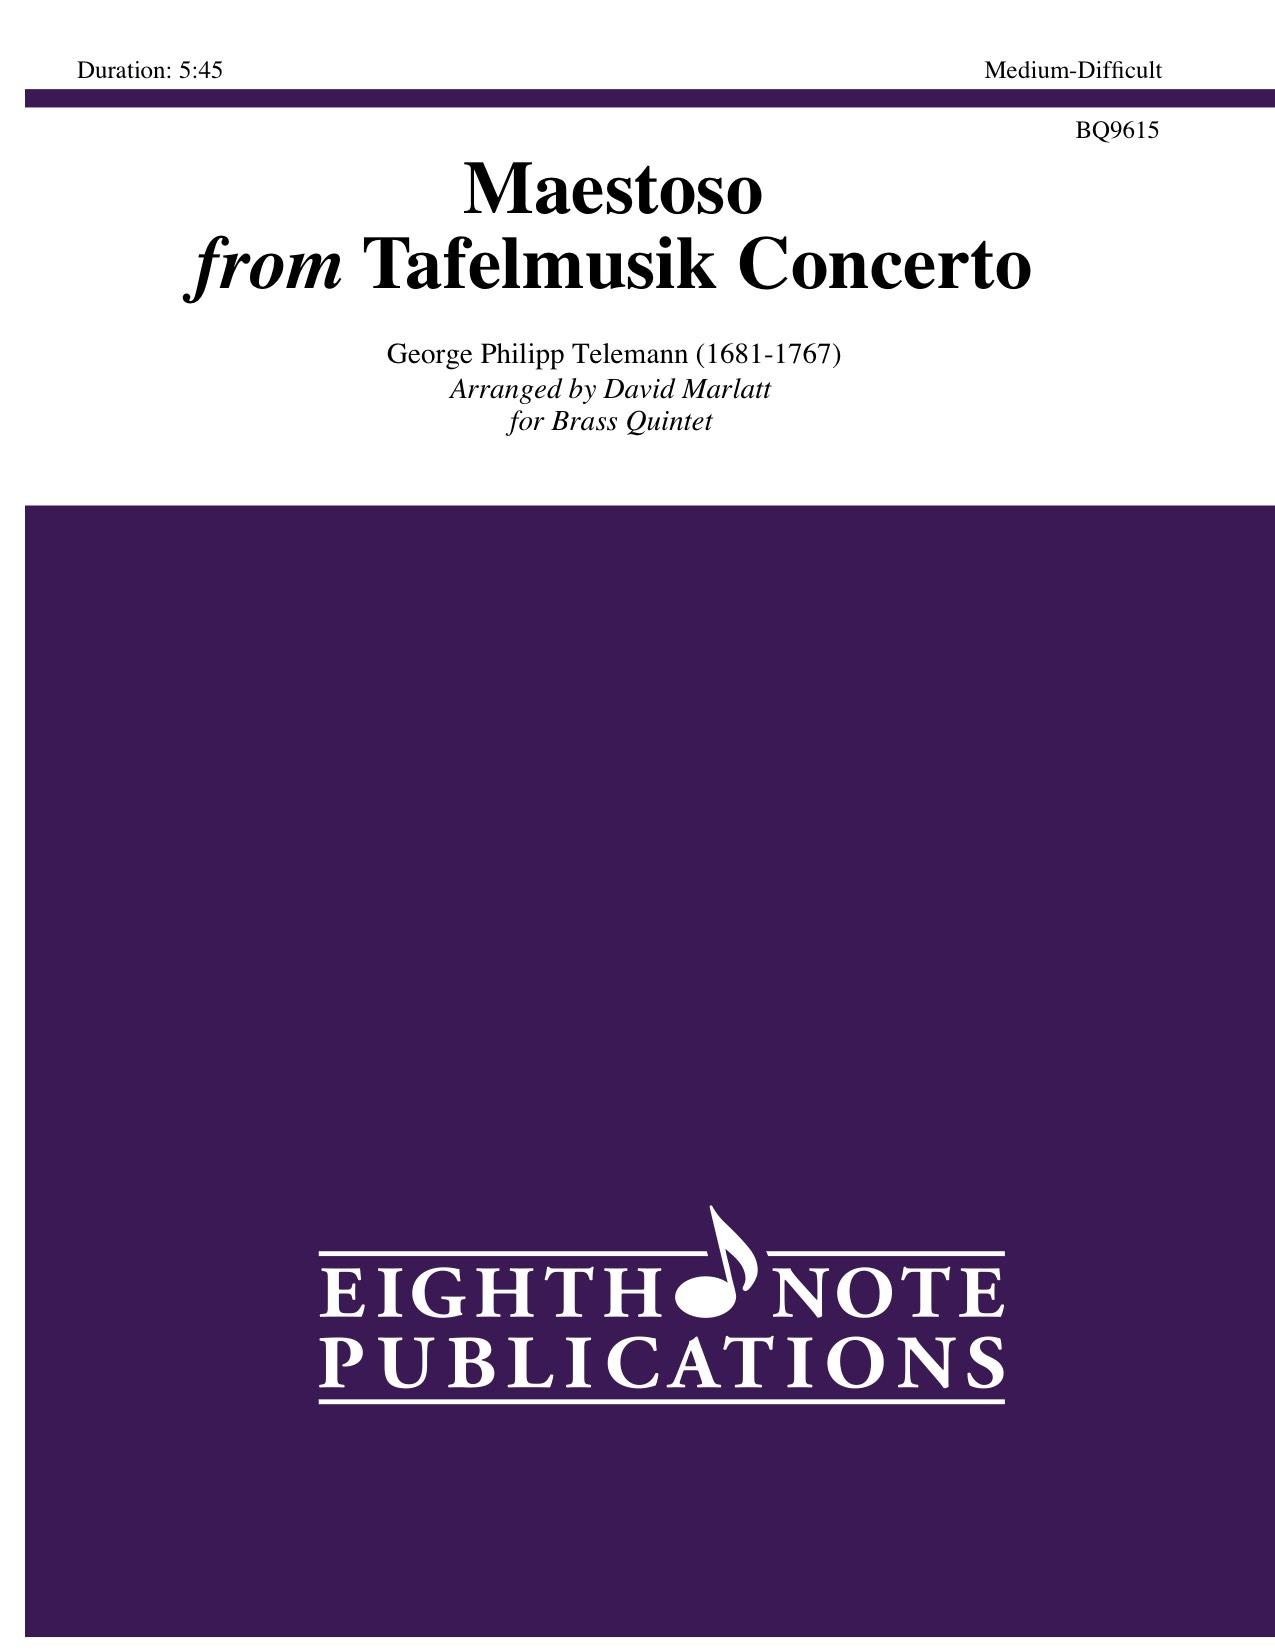 Maestoso from Tafelmusik Concerto - George Philipp Telemann